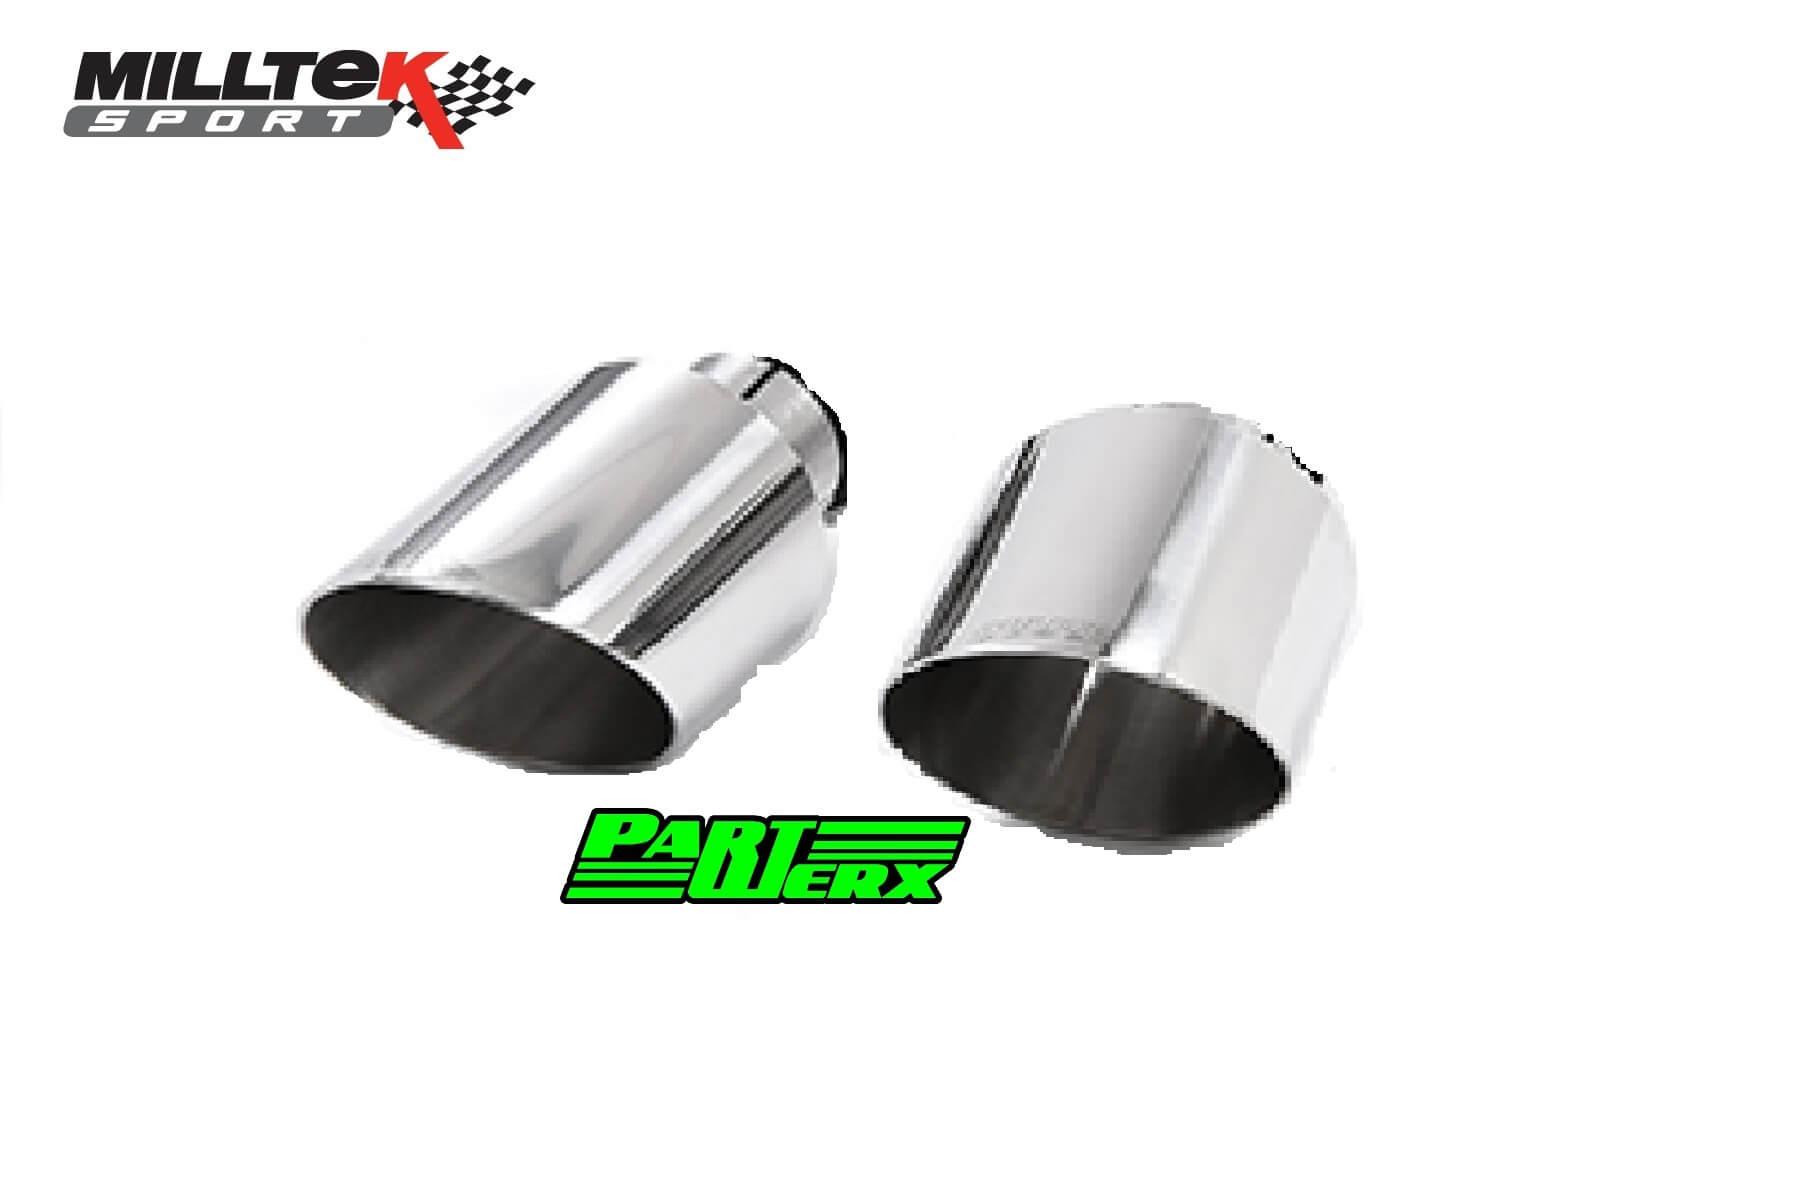 ford focus mk3 rs 2 3 milltek sport 4 5 tailpipe trim dual gt115 exhaust tips